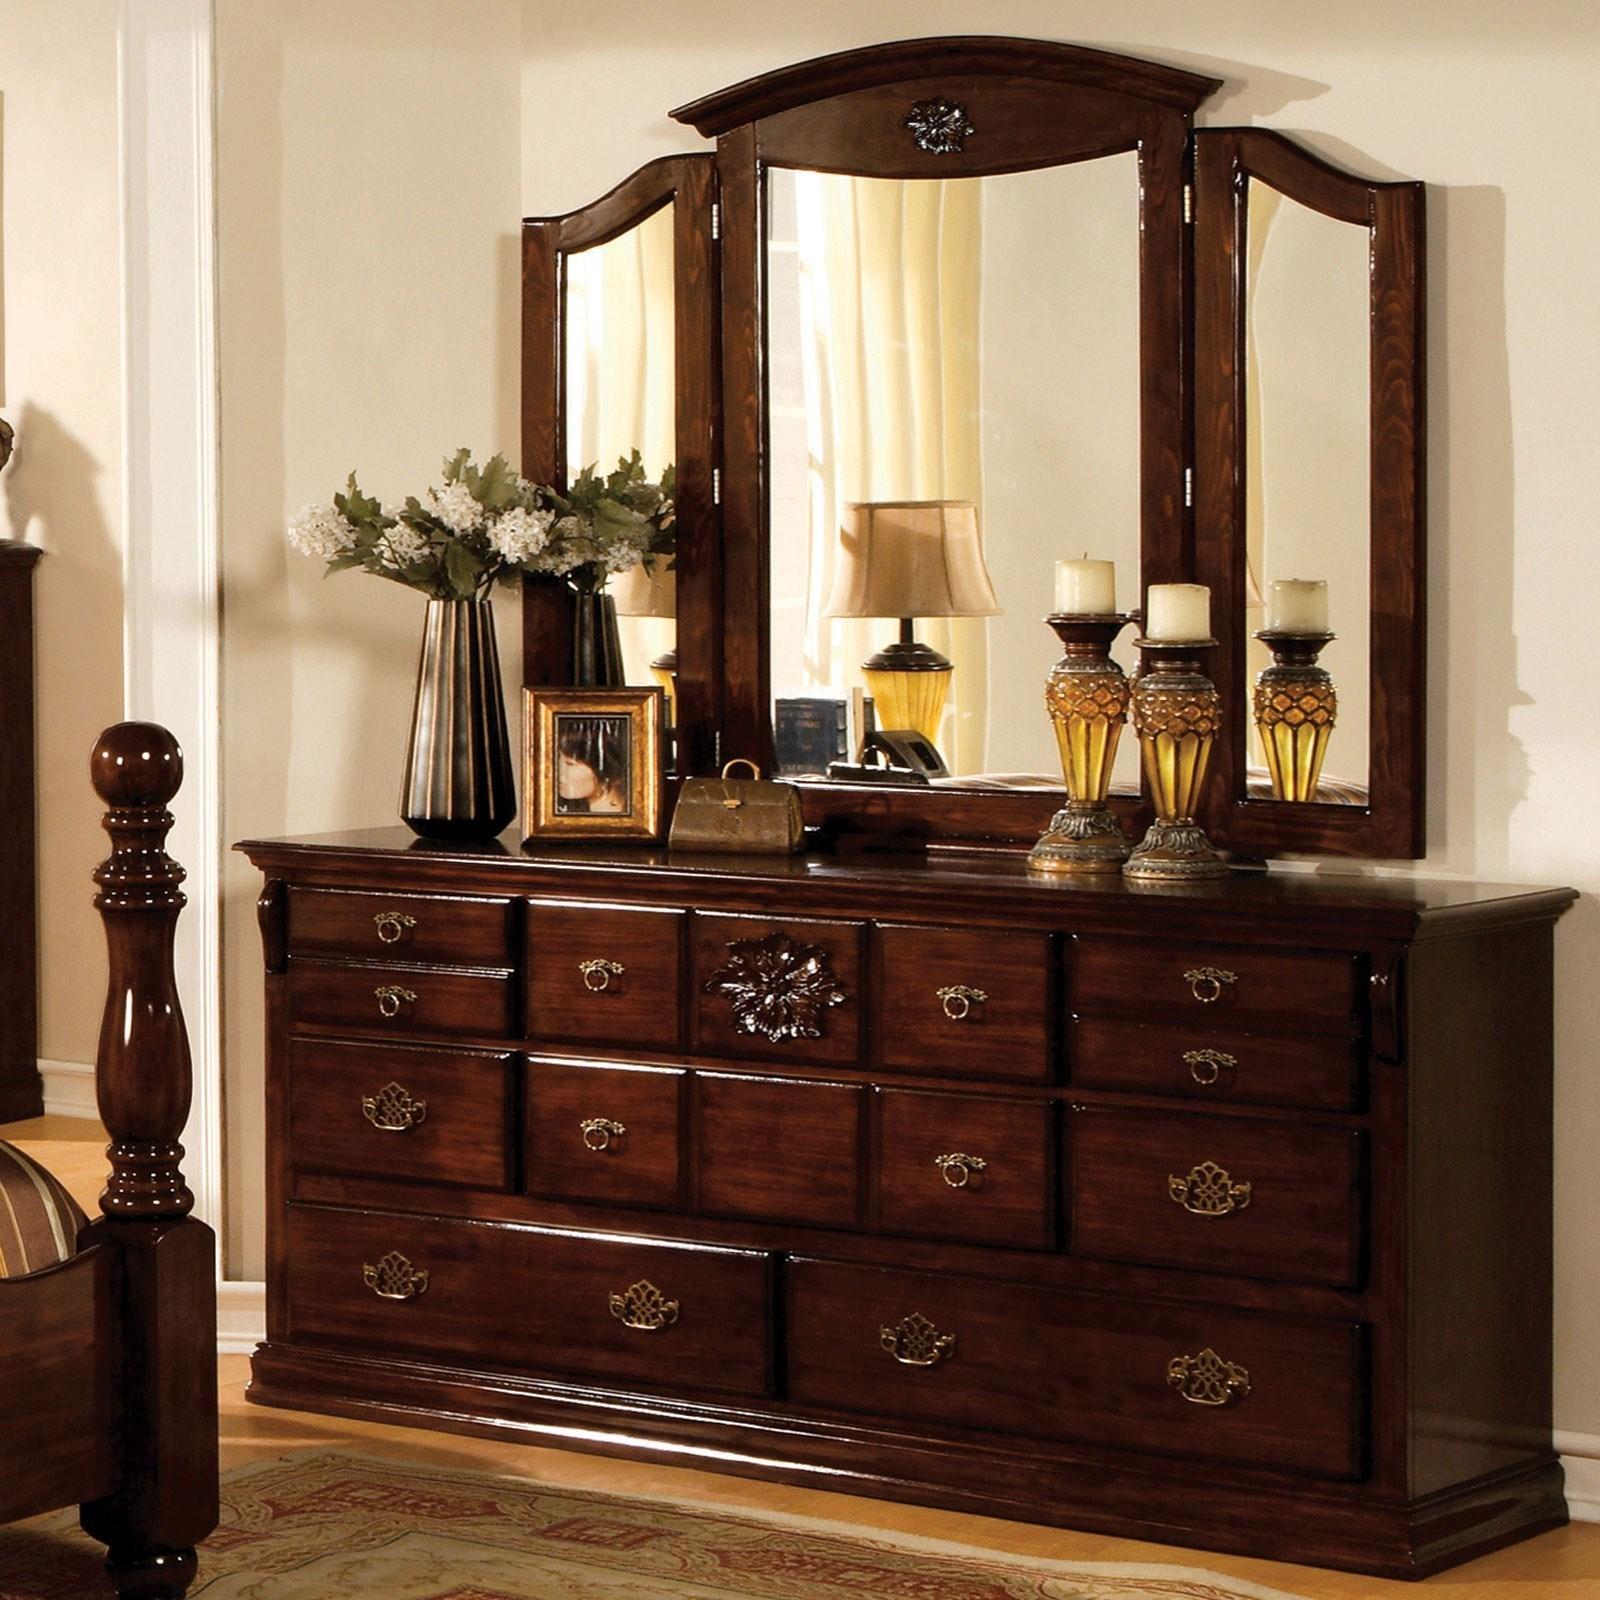 Tuscan II Dresser at Household Furniture